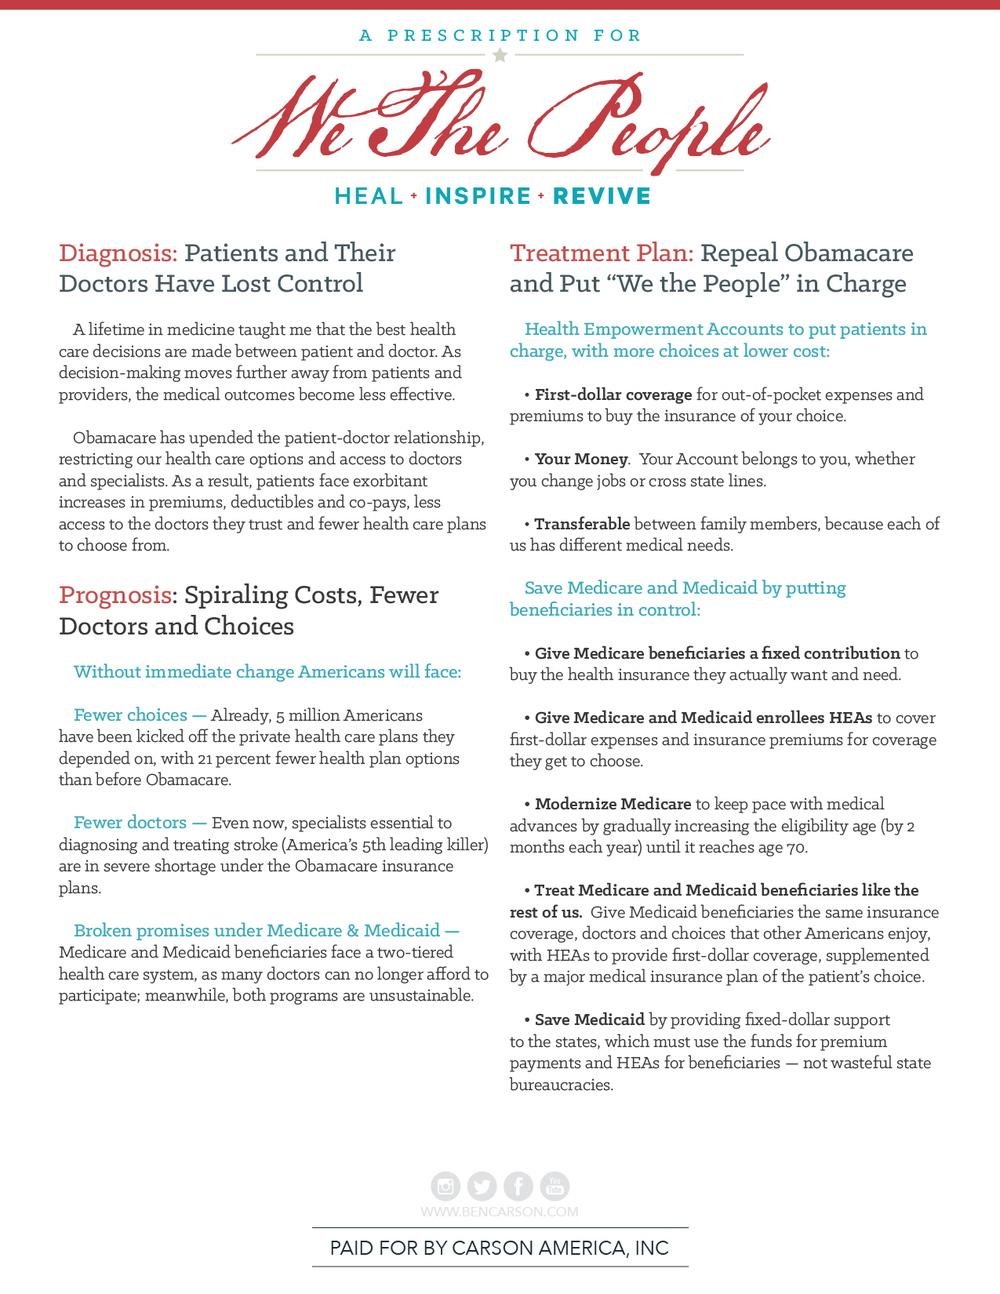 20151209_PolicyBook_healthcare_scrape10.jpg